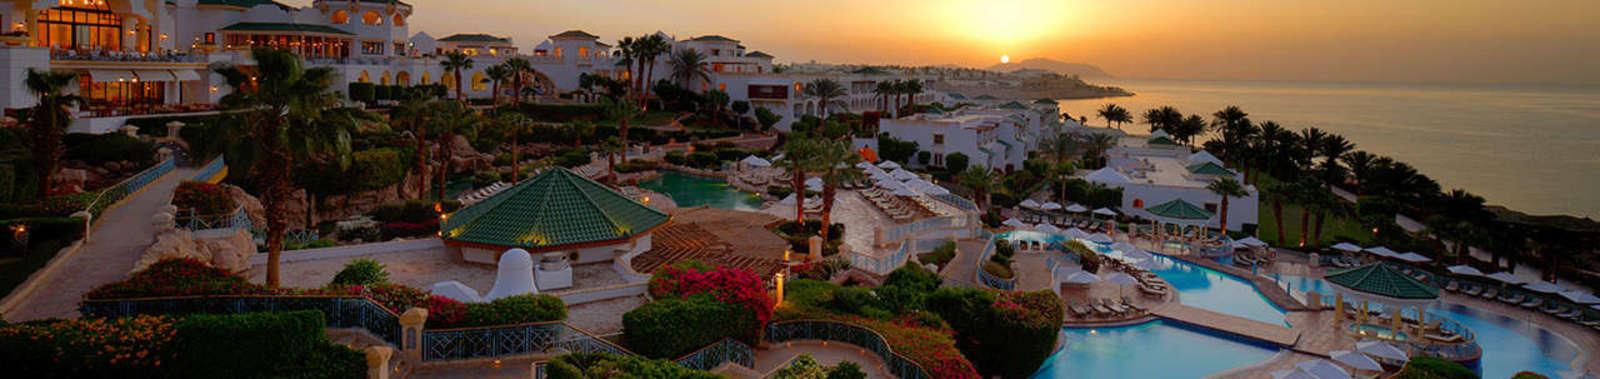 Hyatt-Regency-Sharm-El-Sheikh-P008-Exterior-Sunrise-1280x427